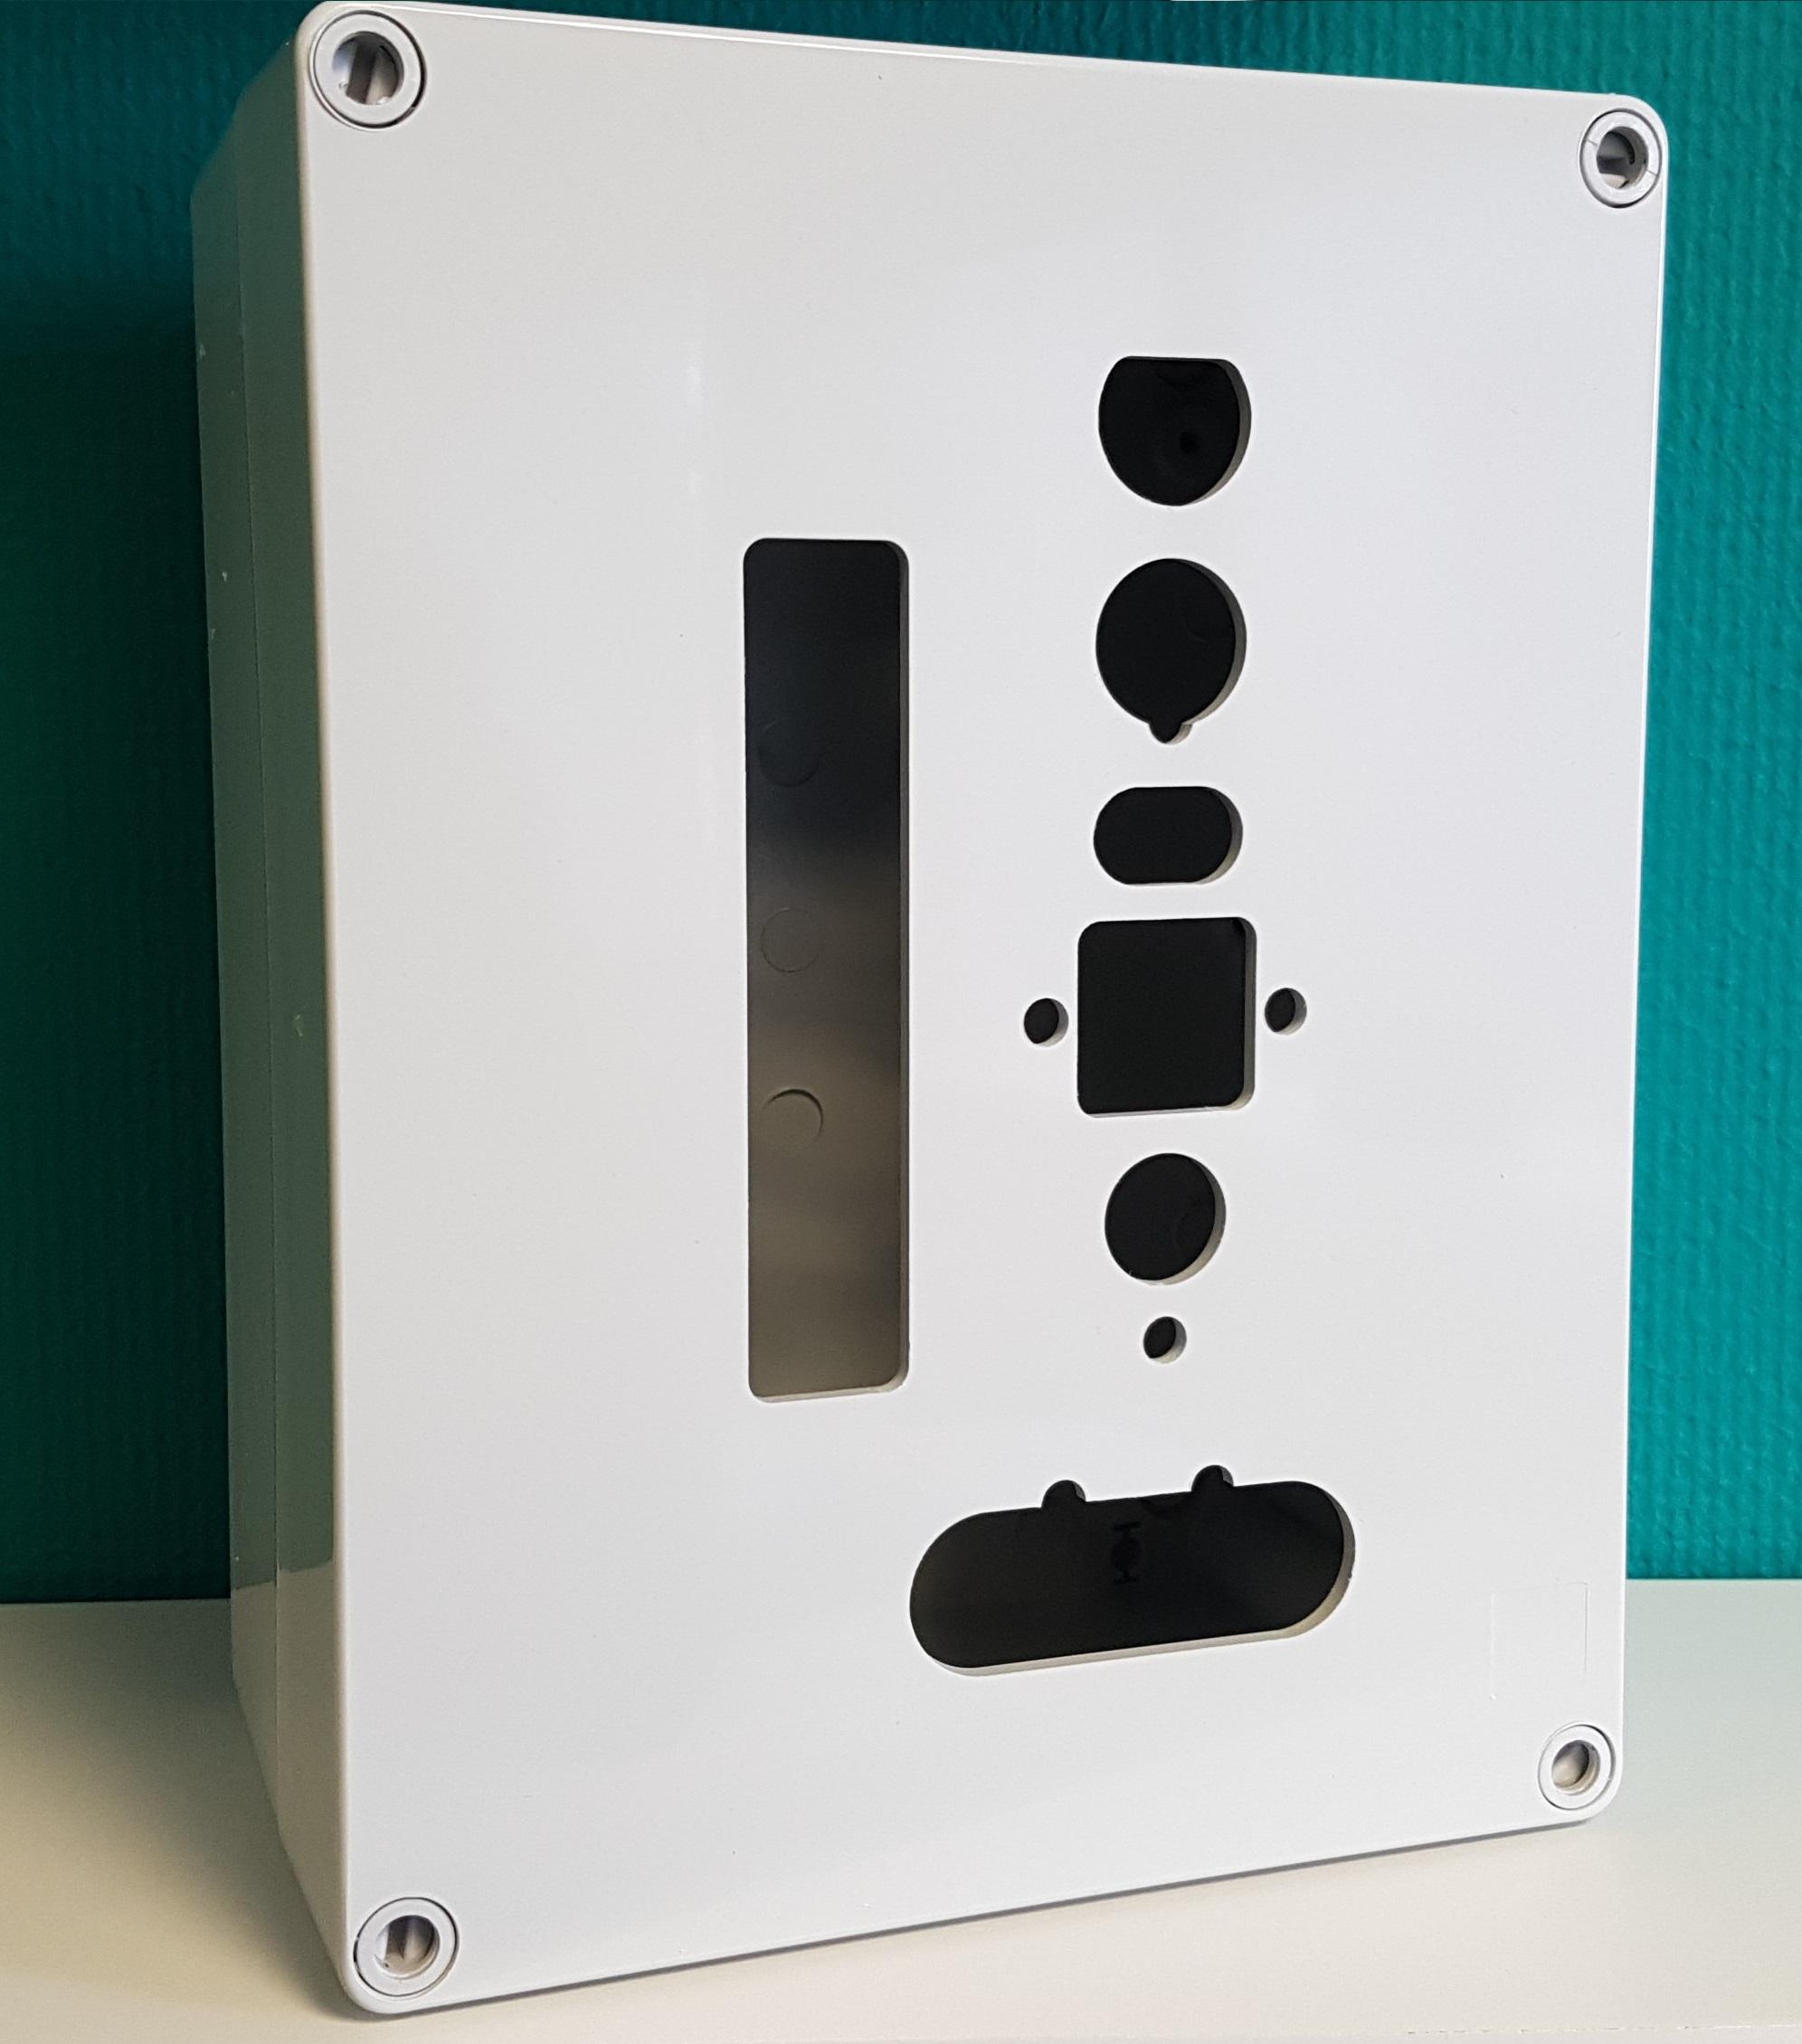 frezen gaten uitsparingen ABS PVC PC Polyester